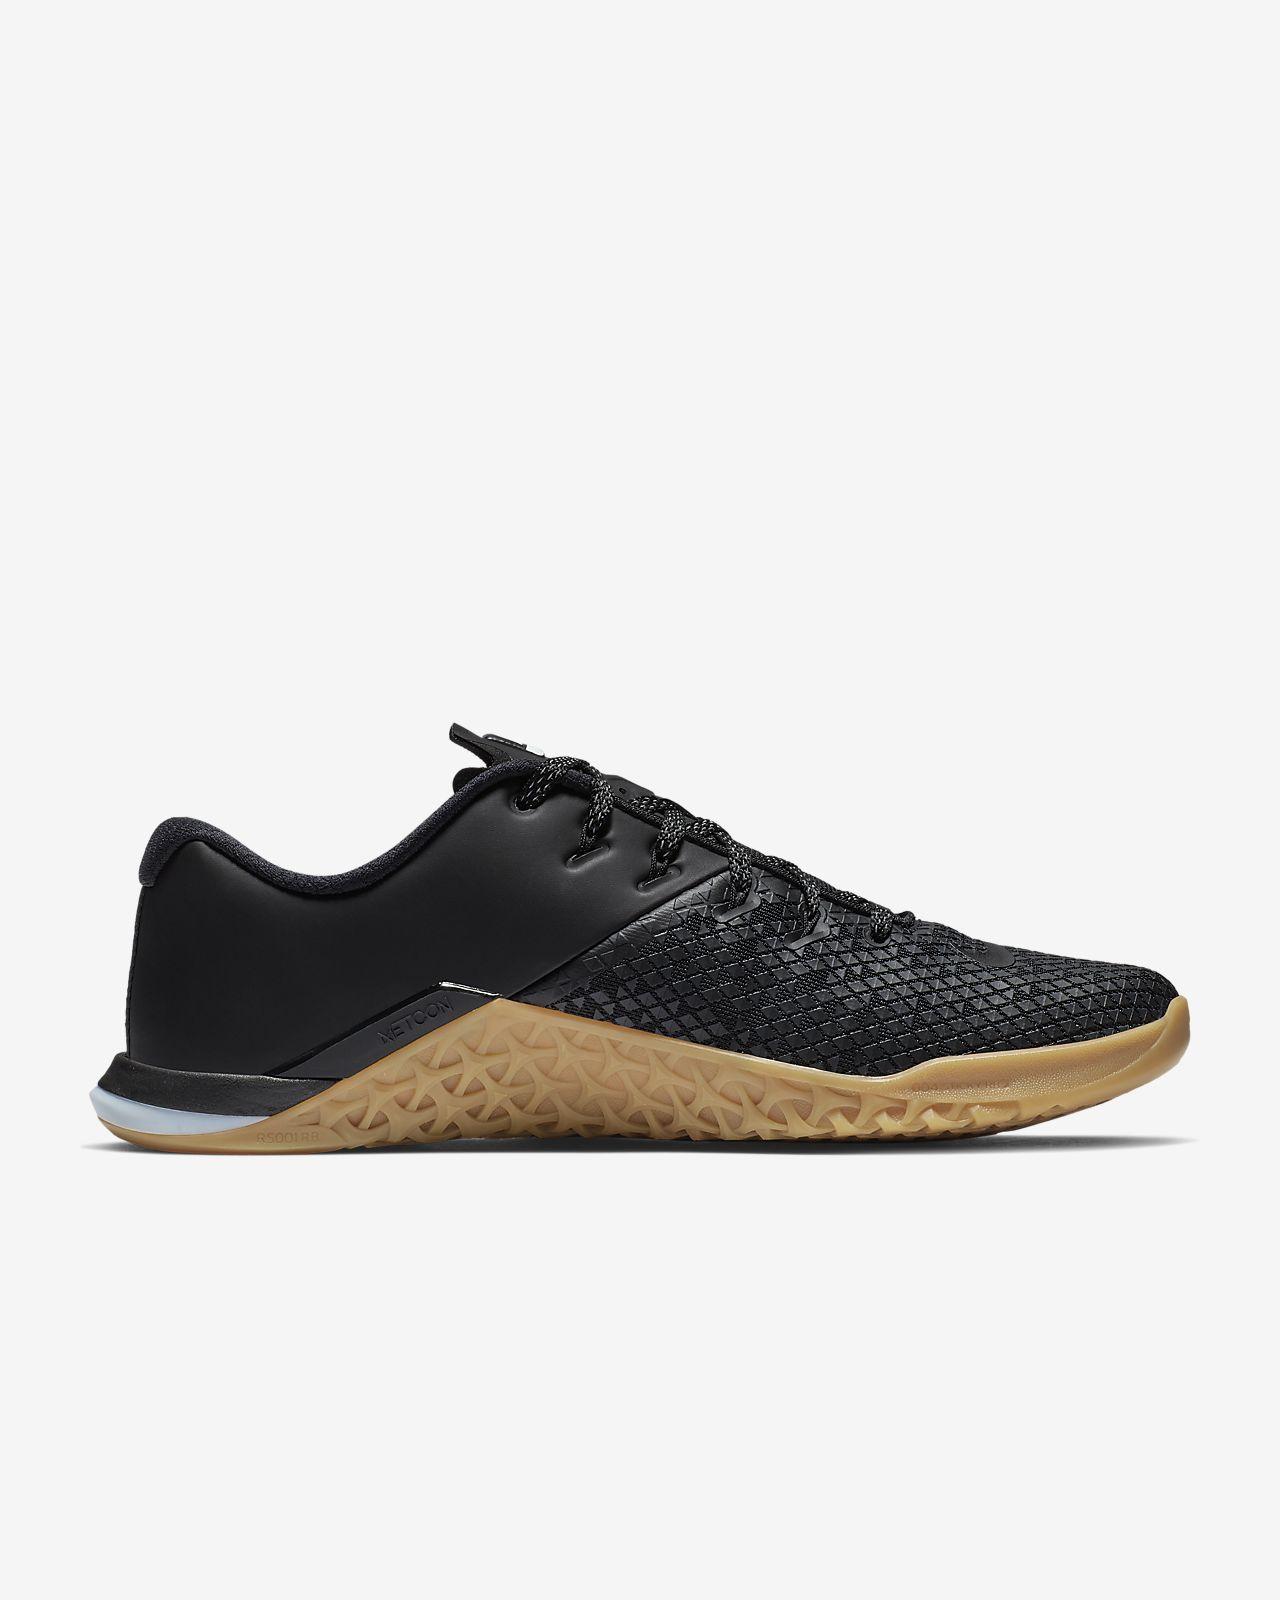 9a424d9fc7a7 ... Nike Metcon 4 XD X Chalkboard Men s Cross-Training Weightlifting Shoe